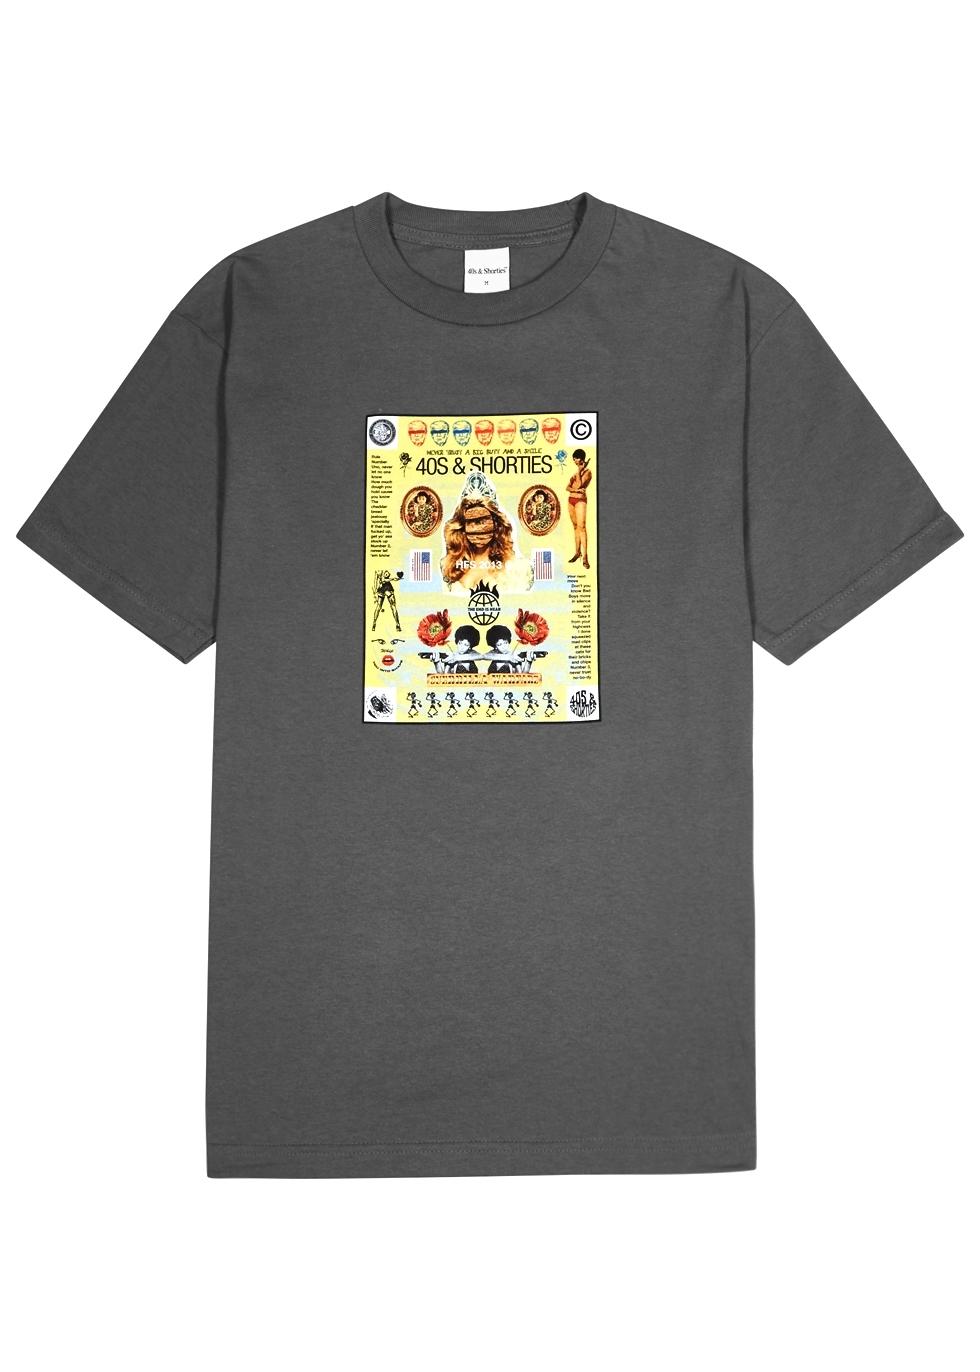 T Shirts Vests Mens Harvey Nichols Kaos Polos Choco Solid